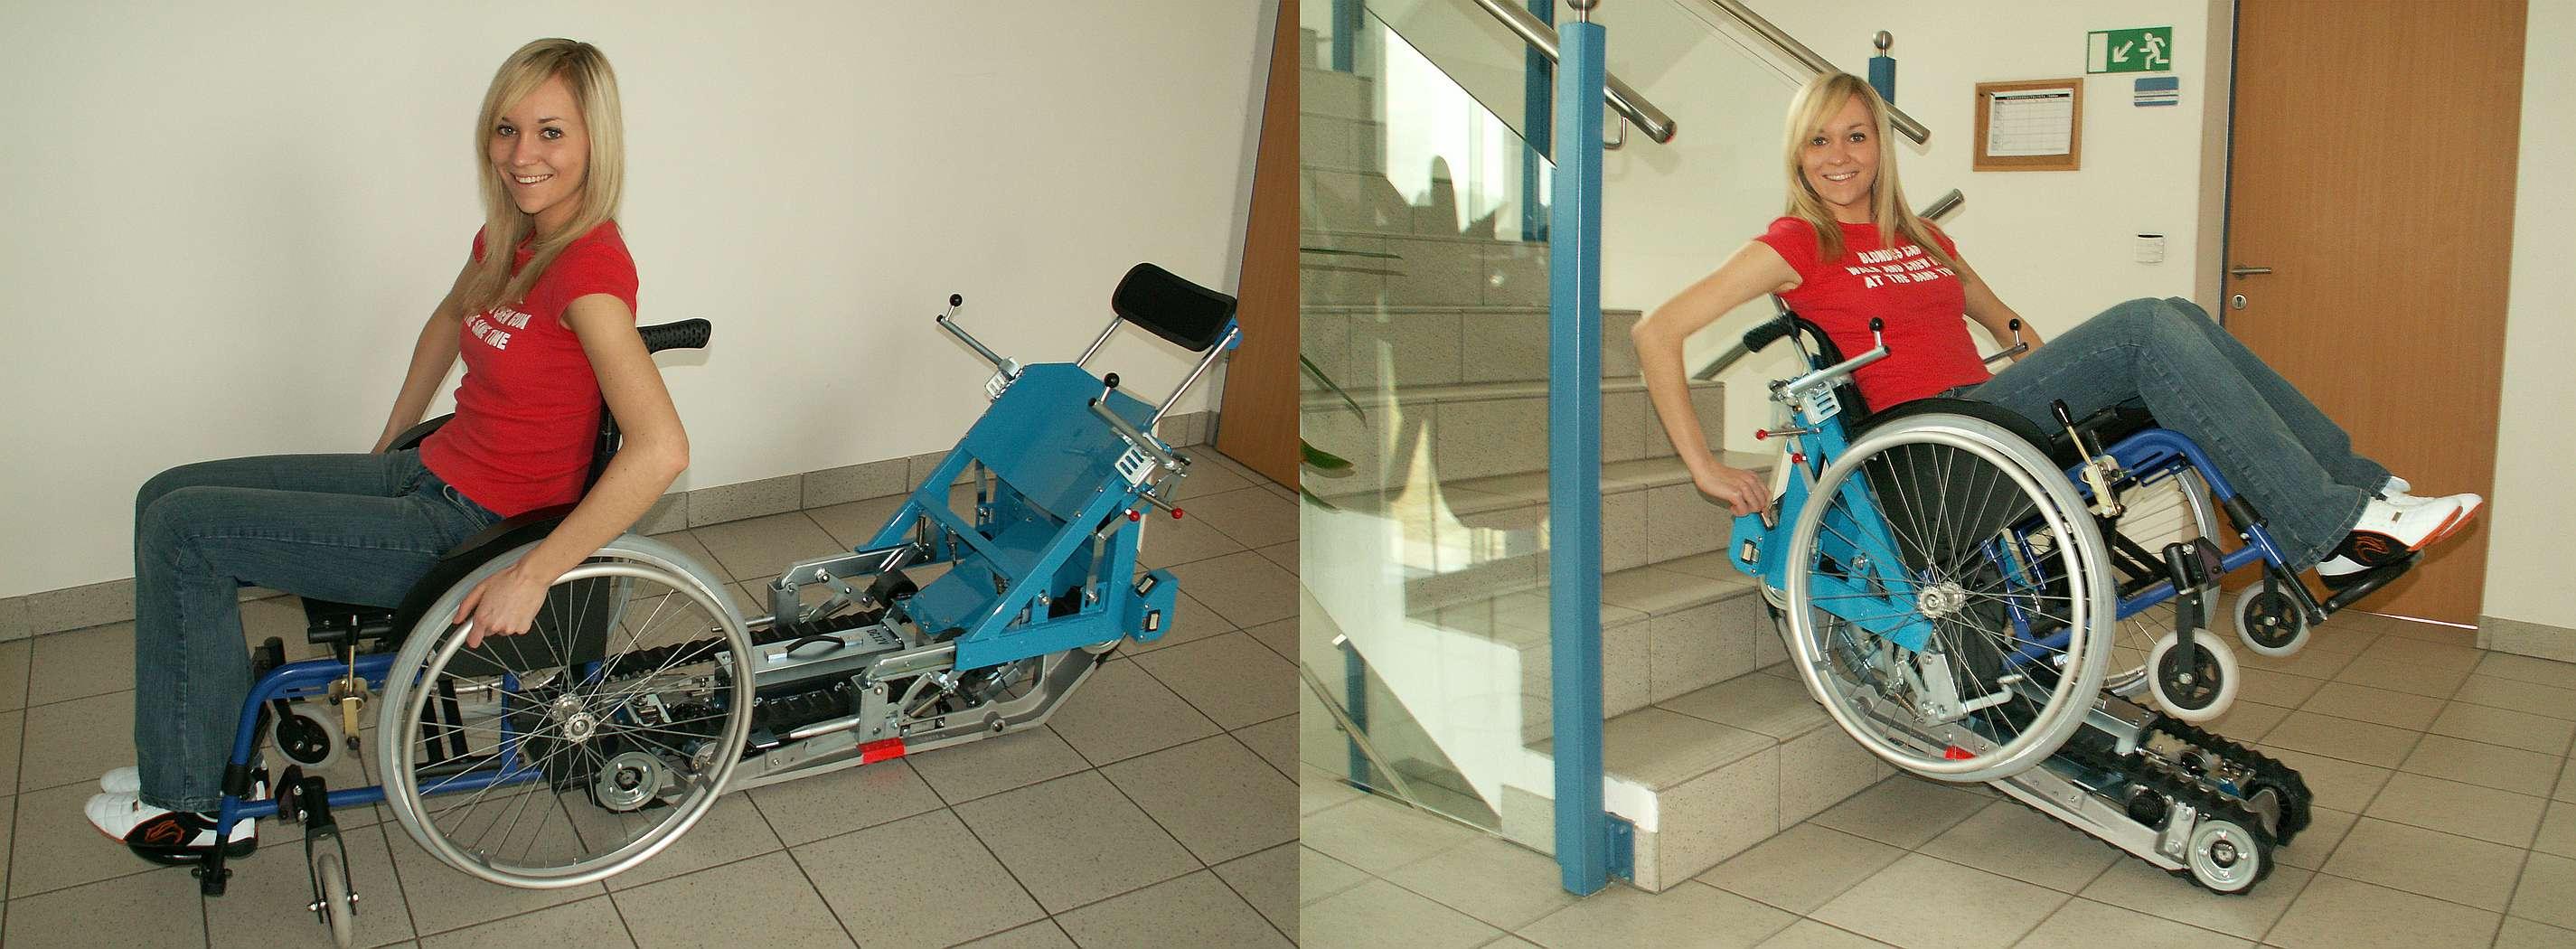 Autonomous stairclimber